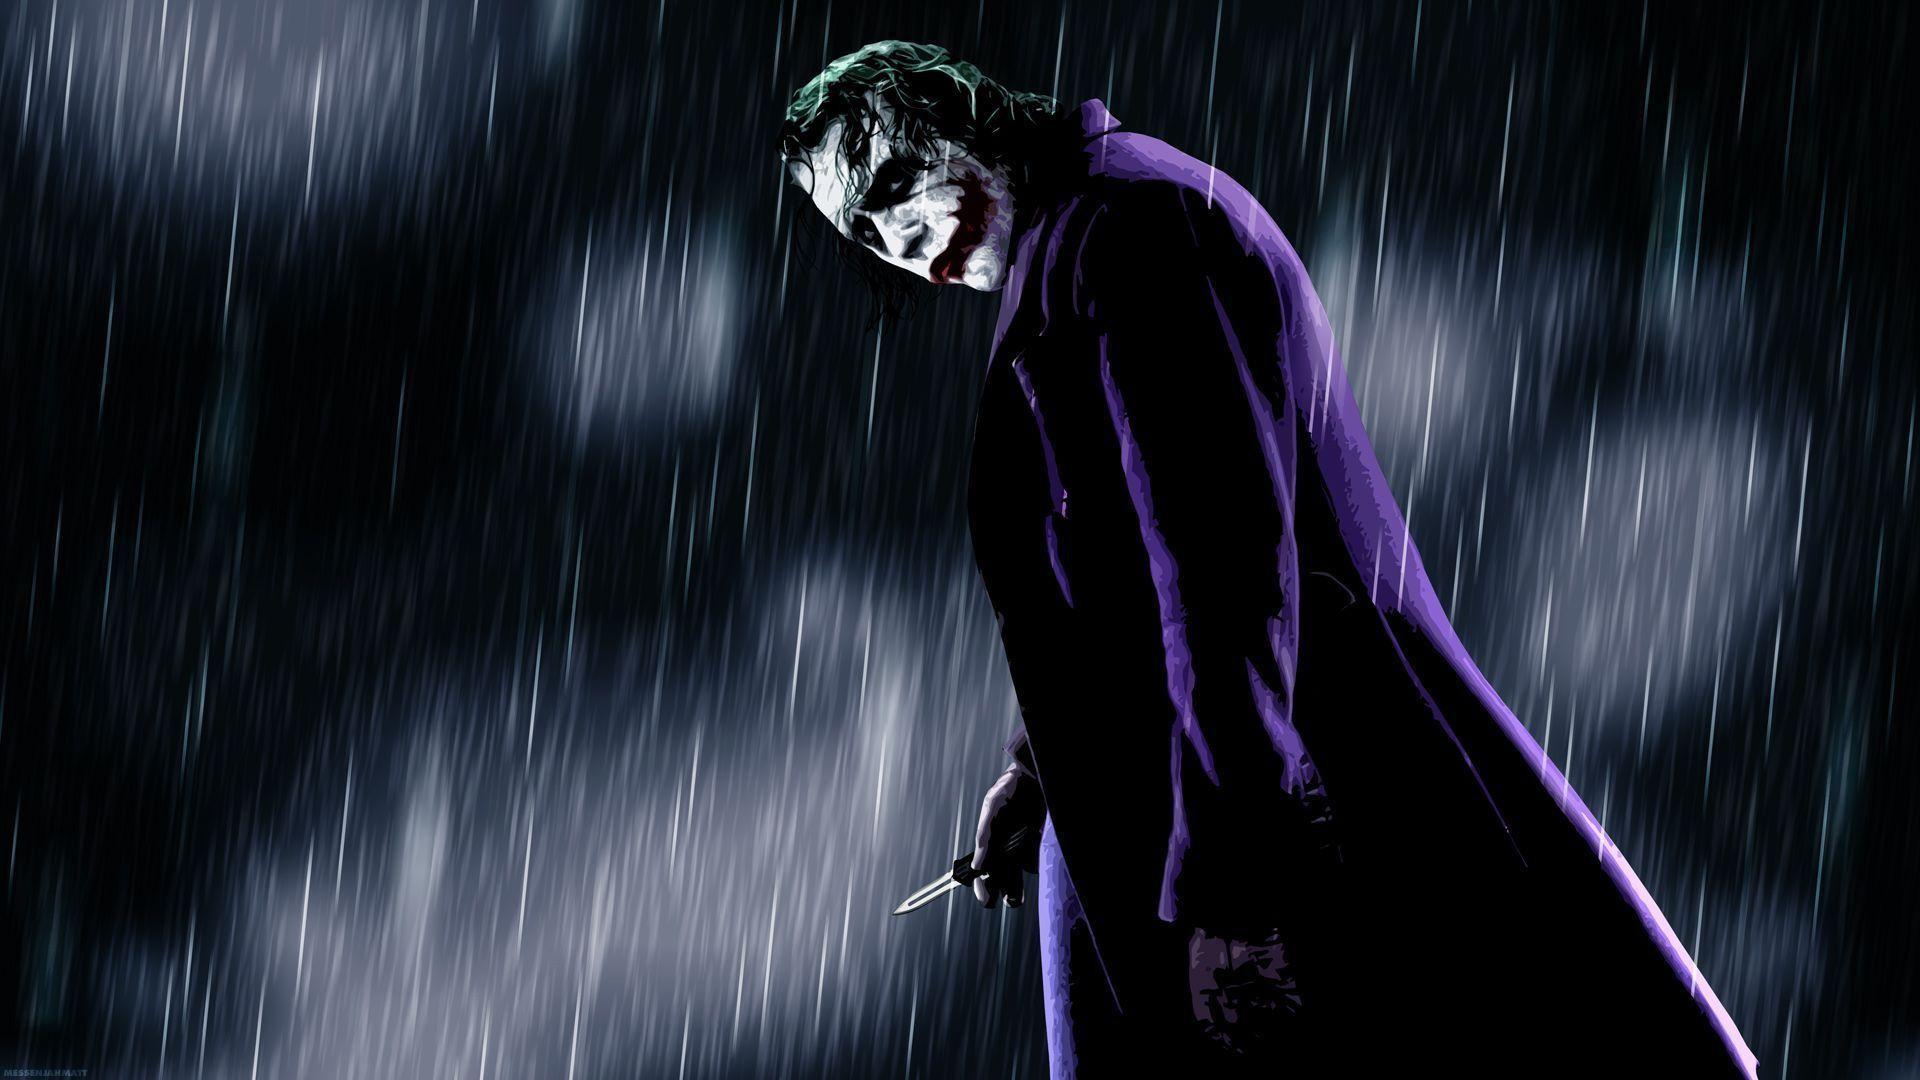 Image Batmanthejokerdbatmanthedarkknighthdwallpapers 1920A 1080 The Joker Dark Knight Wallpapers 53